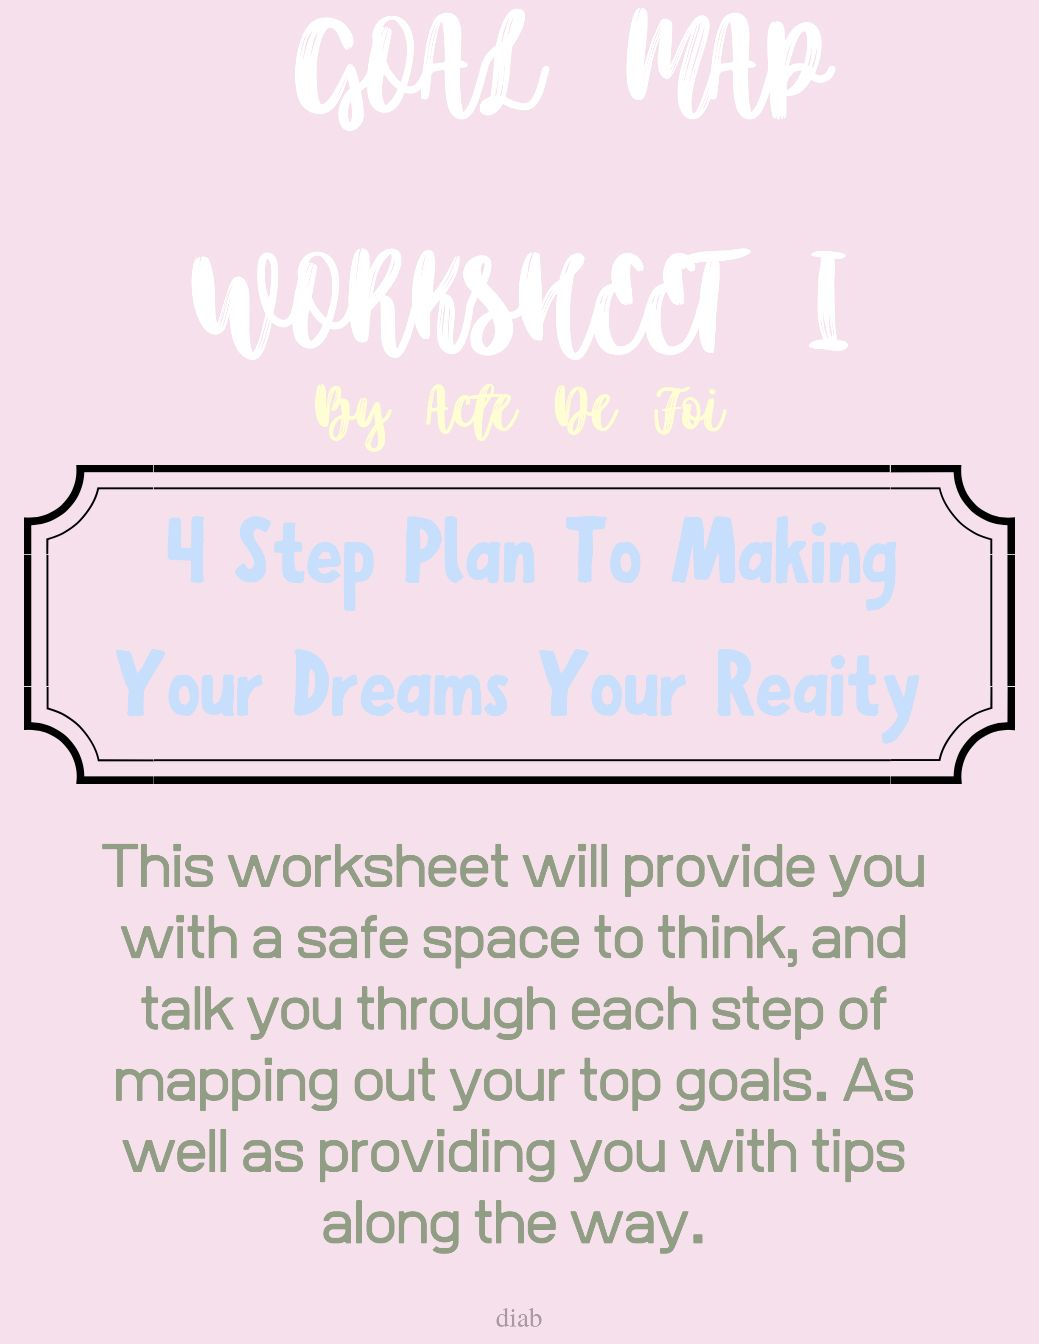 Goal Map Worksheet I In